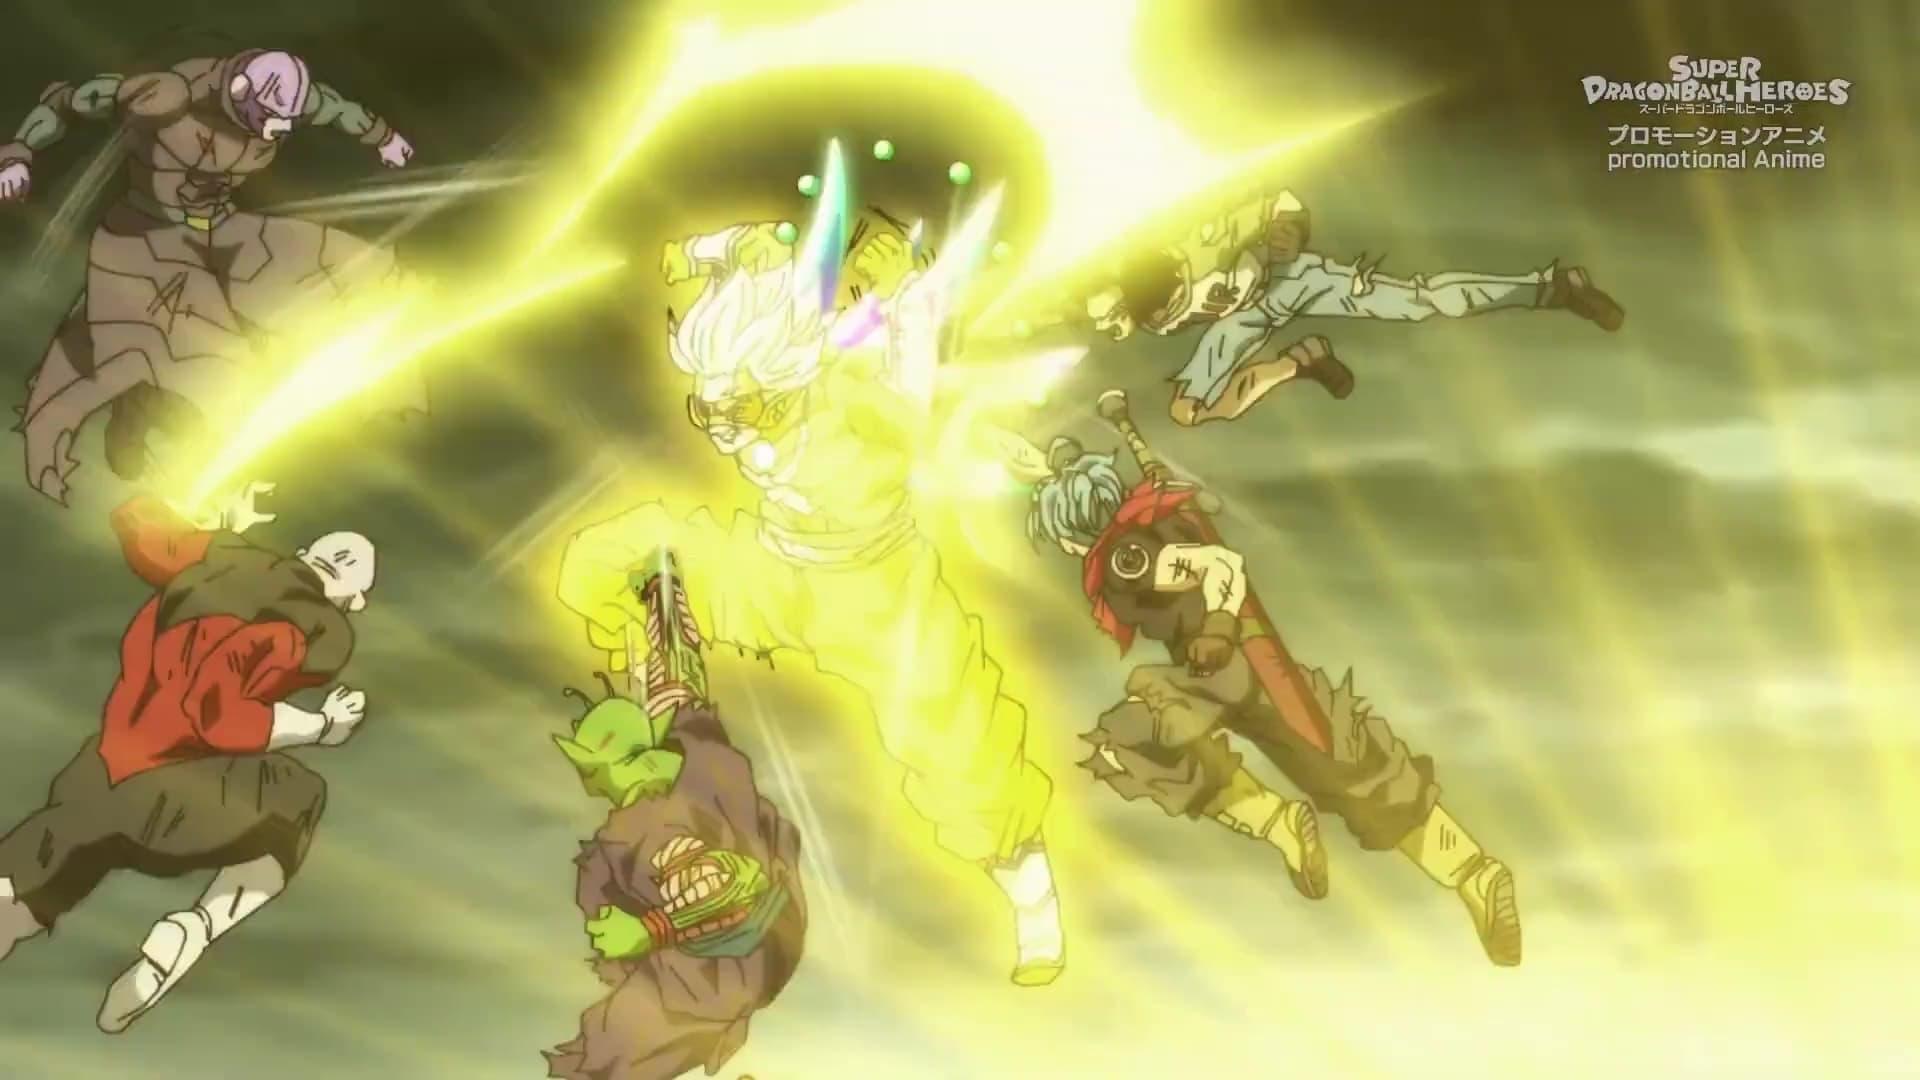 Super Dragon Ball Heroes Season 2 :Episode 11  The Ultimate Godslayer! Hearts is Born!